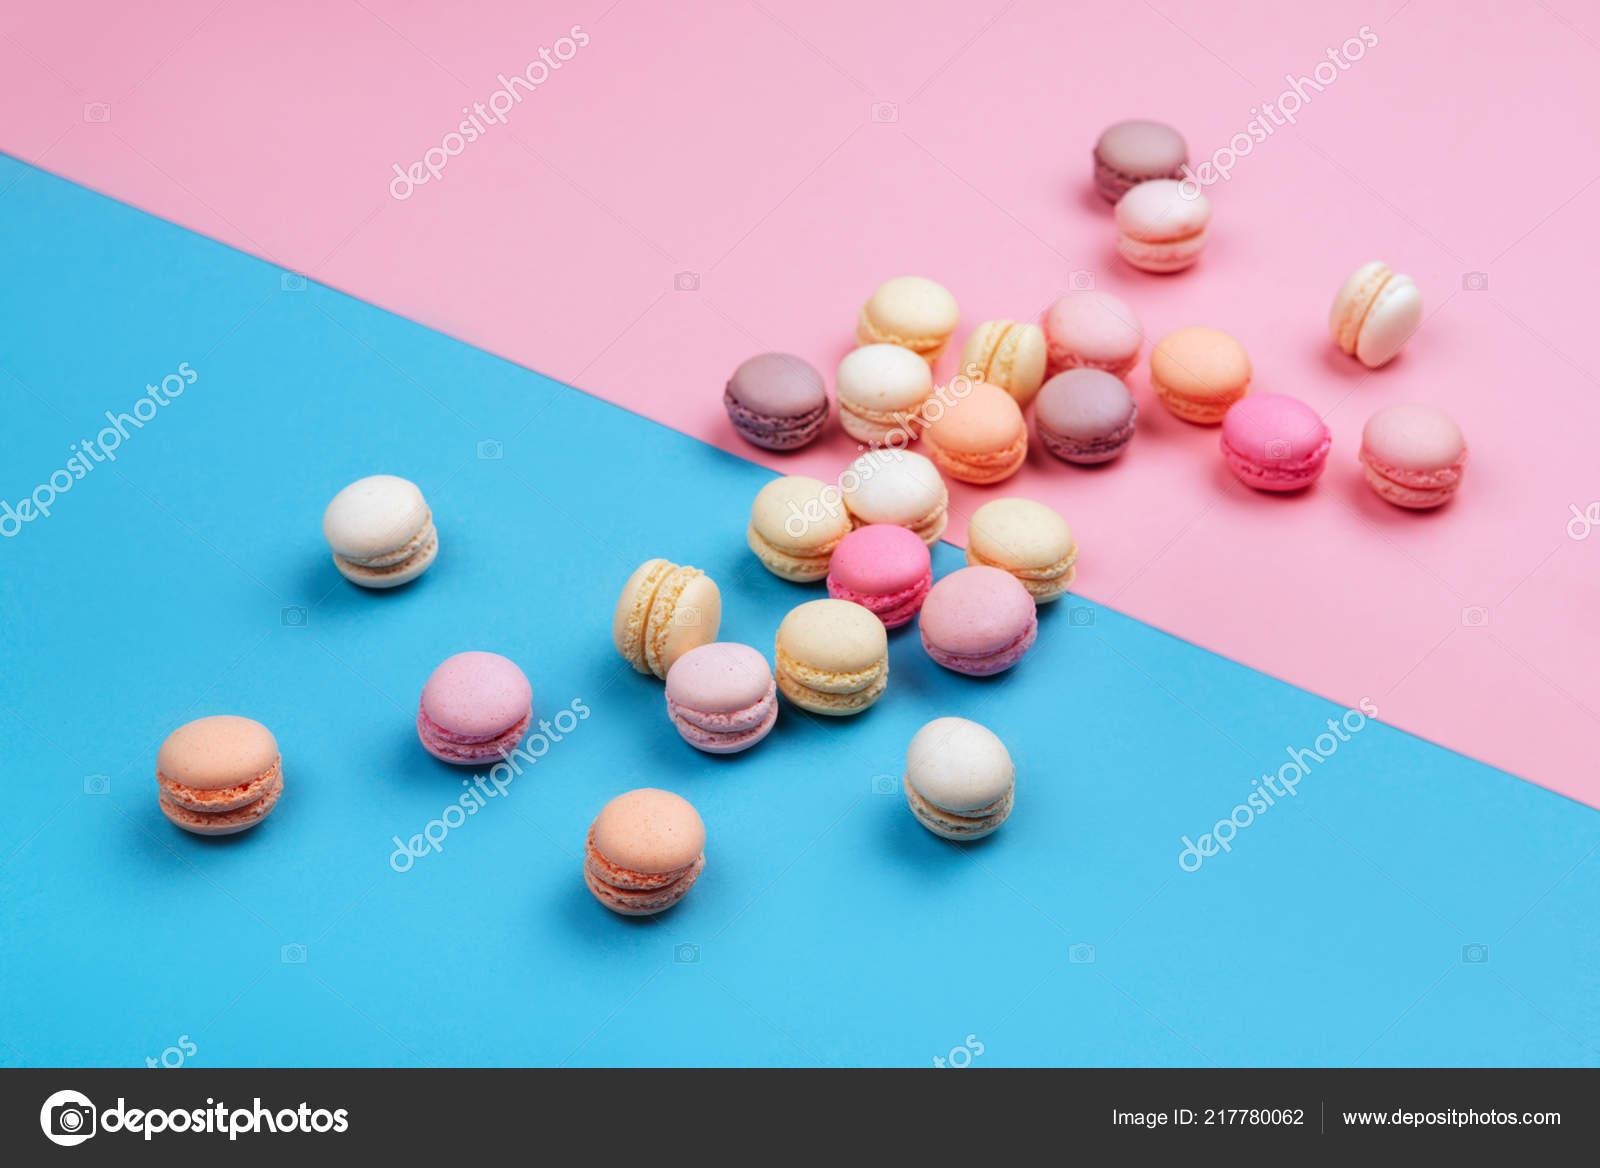 Cake Macaron Macaroon Pink Blue Background Flavor Almond Cookies Pastel Stock Photo C Basarabmargo Gmail Com 217780062